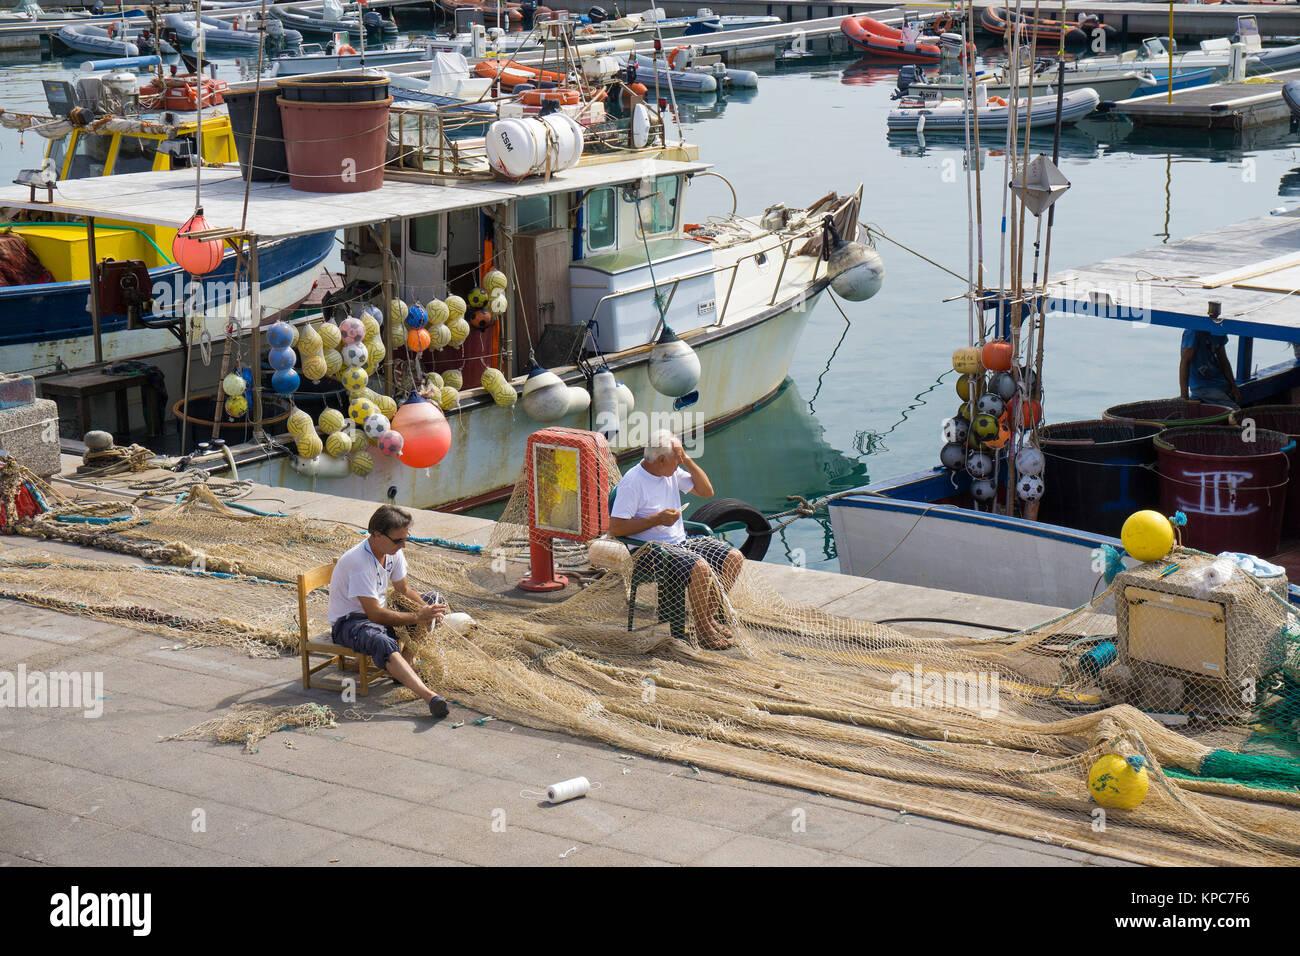 Fishermen repairing nets at the harbour of Isola Rossa, Olbia-Tempio, Sardinia, Italy, Mediterranean  sea, Europe - Stock Image